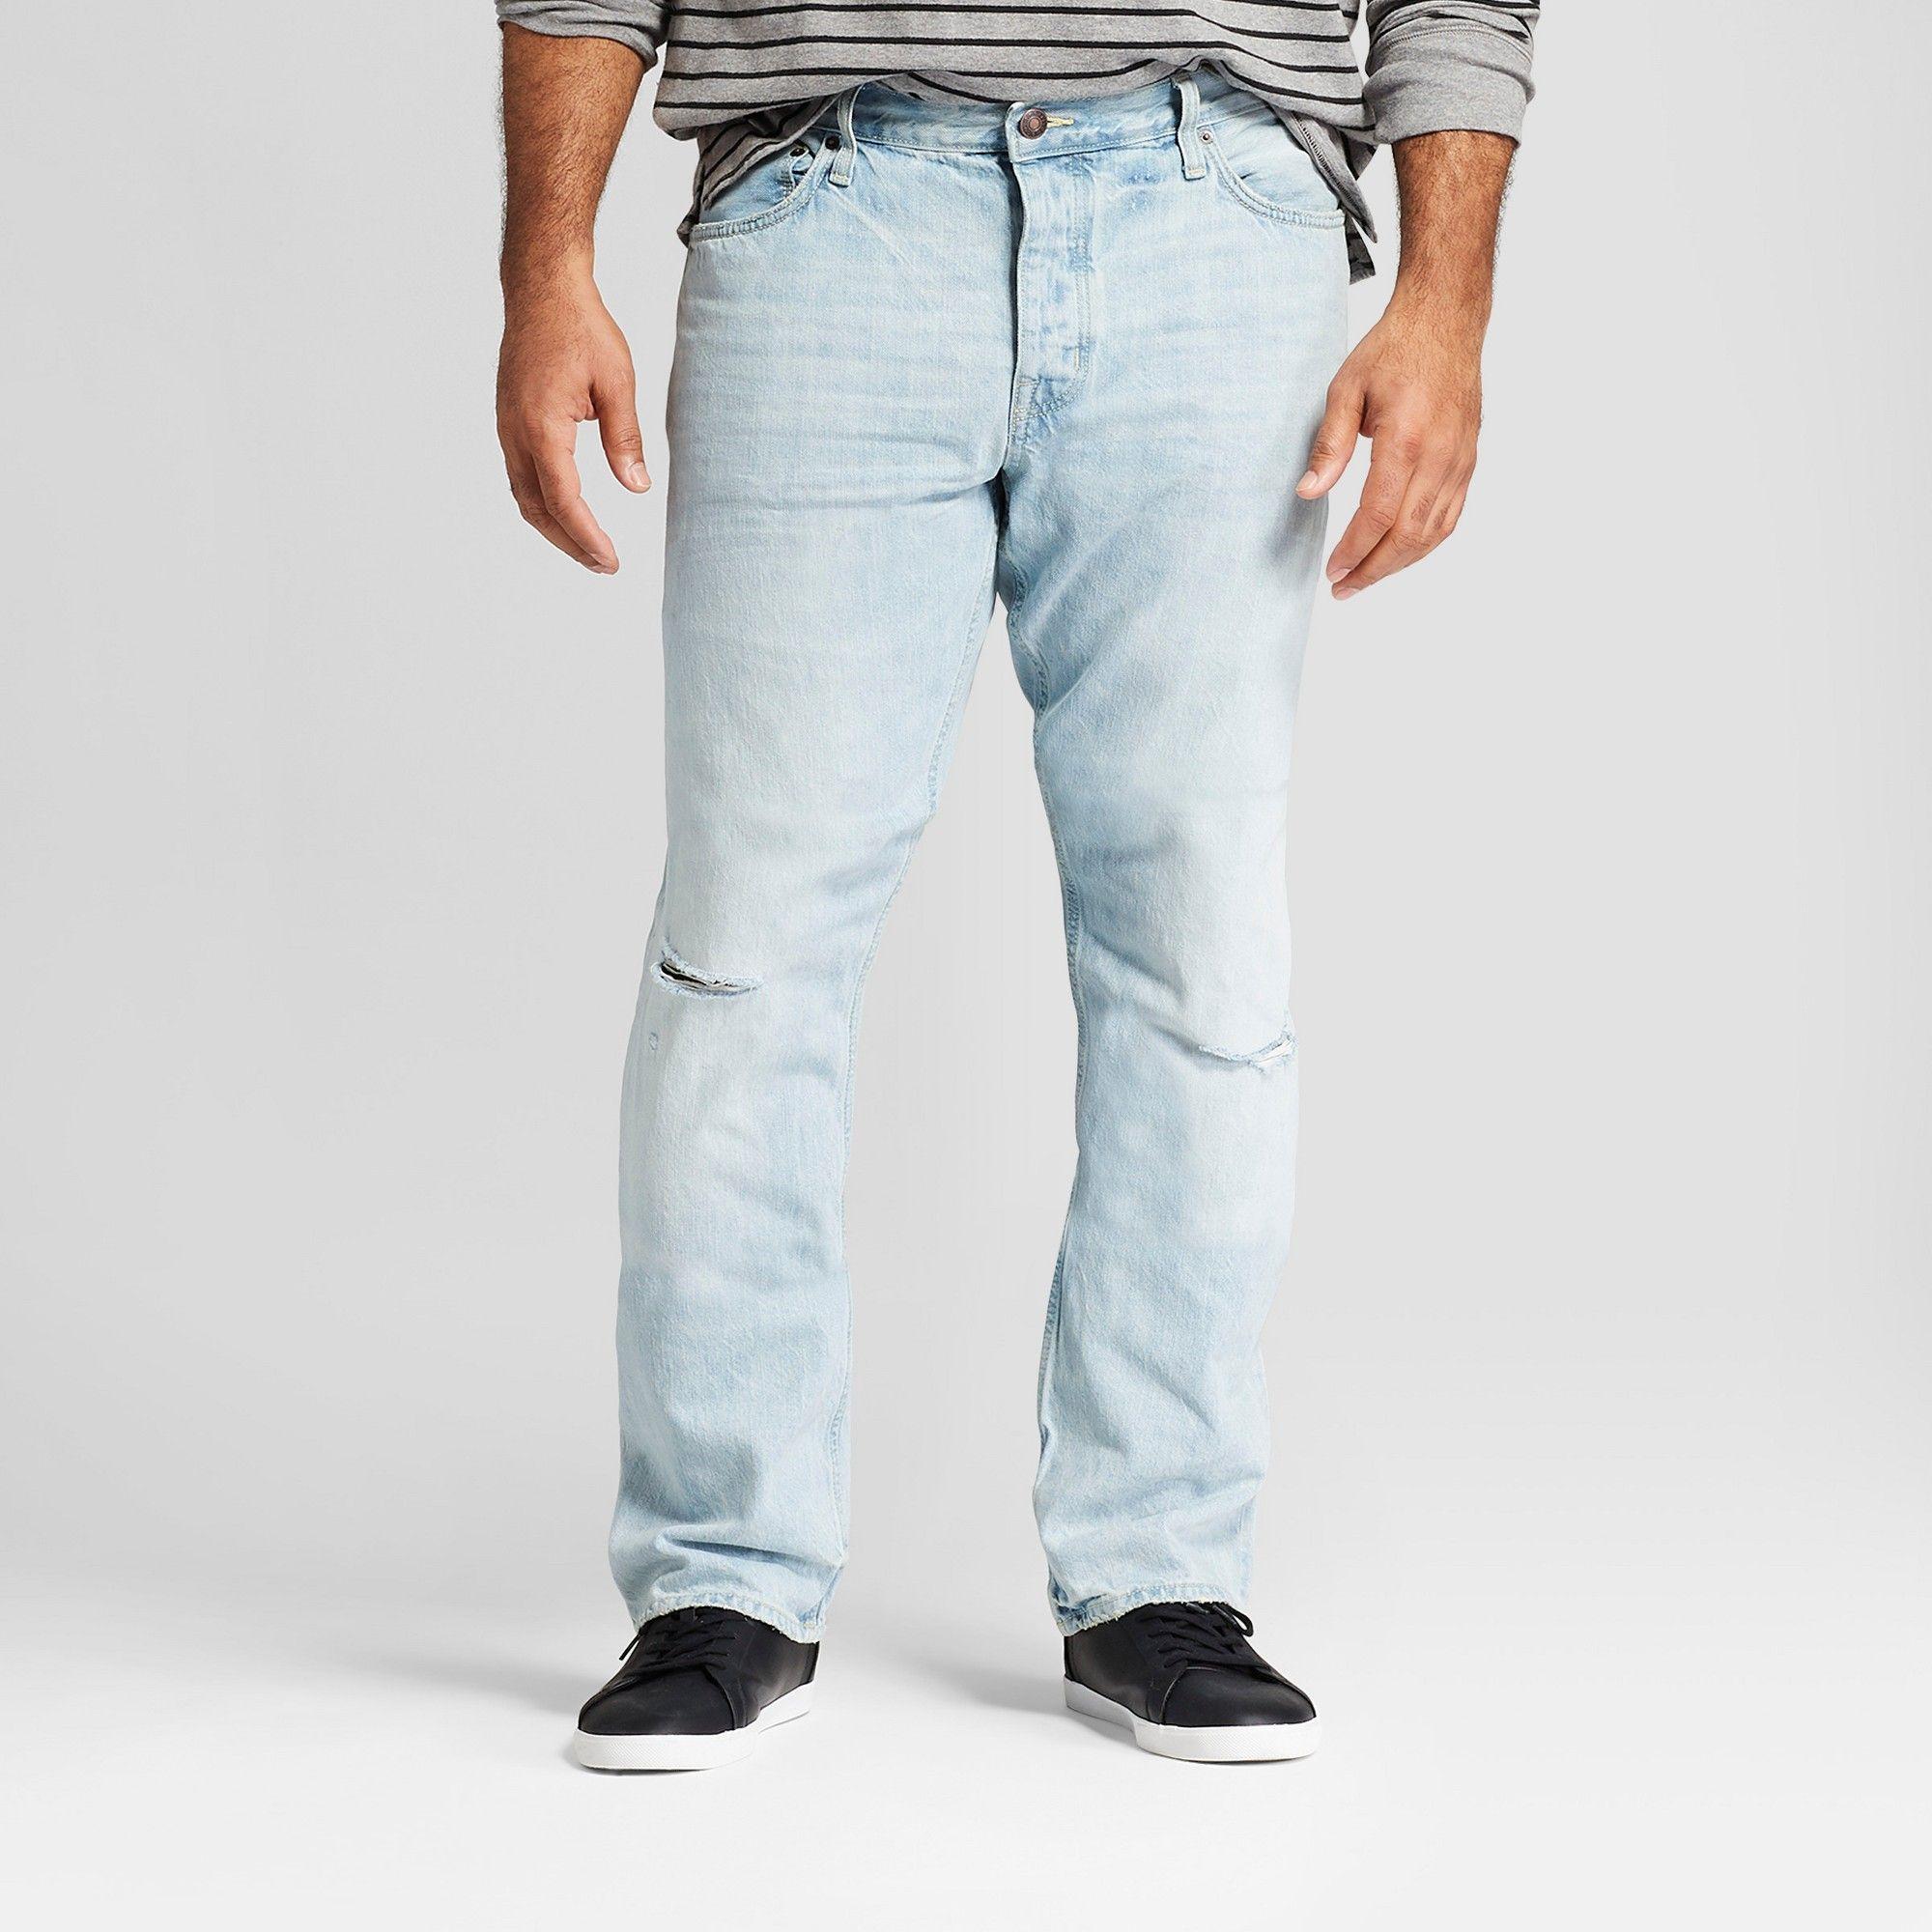 8f7b930c Men's Tall Slim Straight Fit Selvedge Denim Jeans - Goodfellow & Co Light  Wash 31x36, Blue